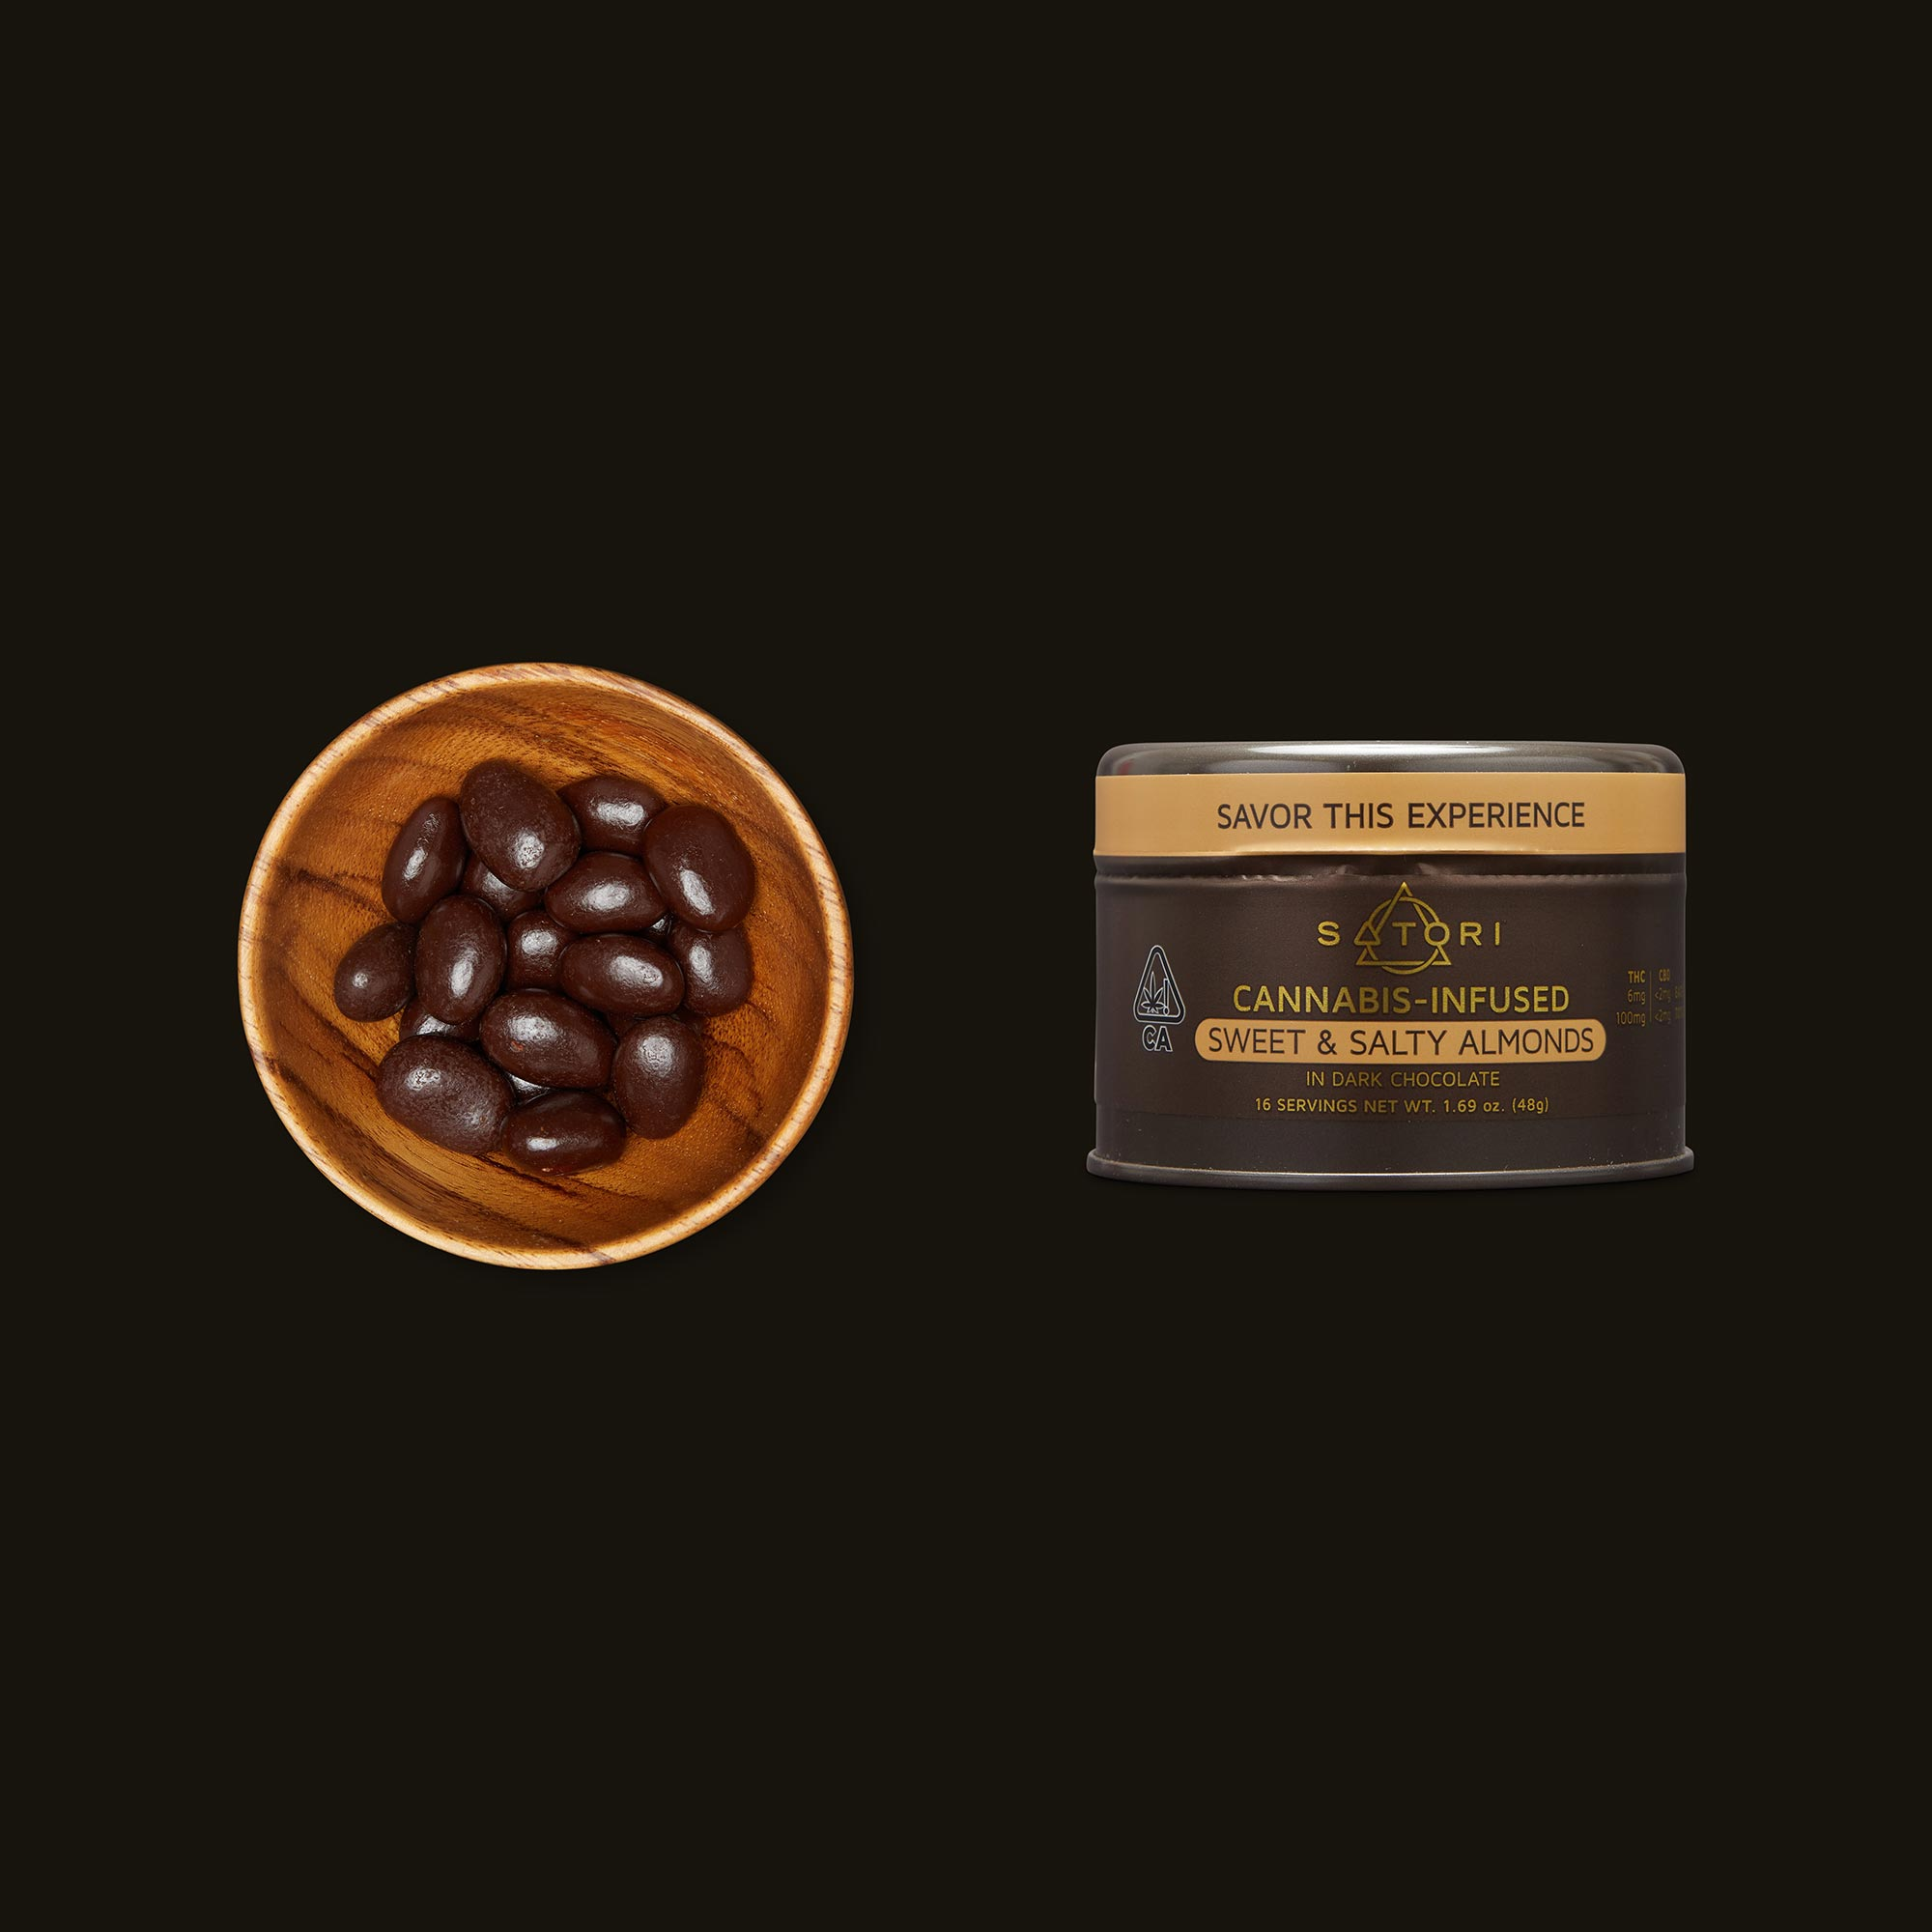 Satori Chocolates Sweet and Salty Almonds